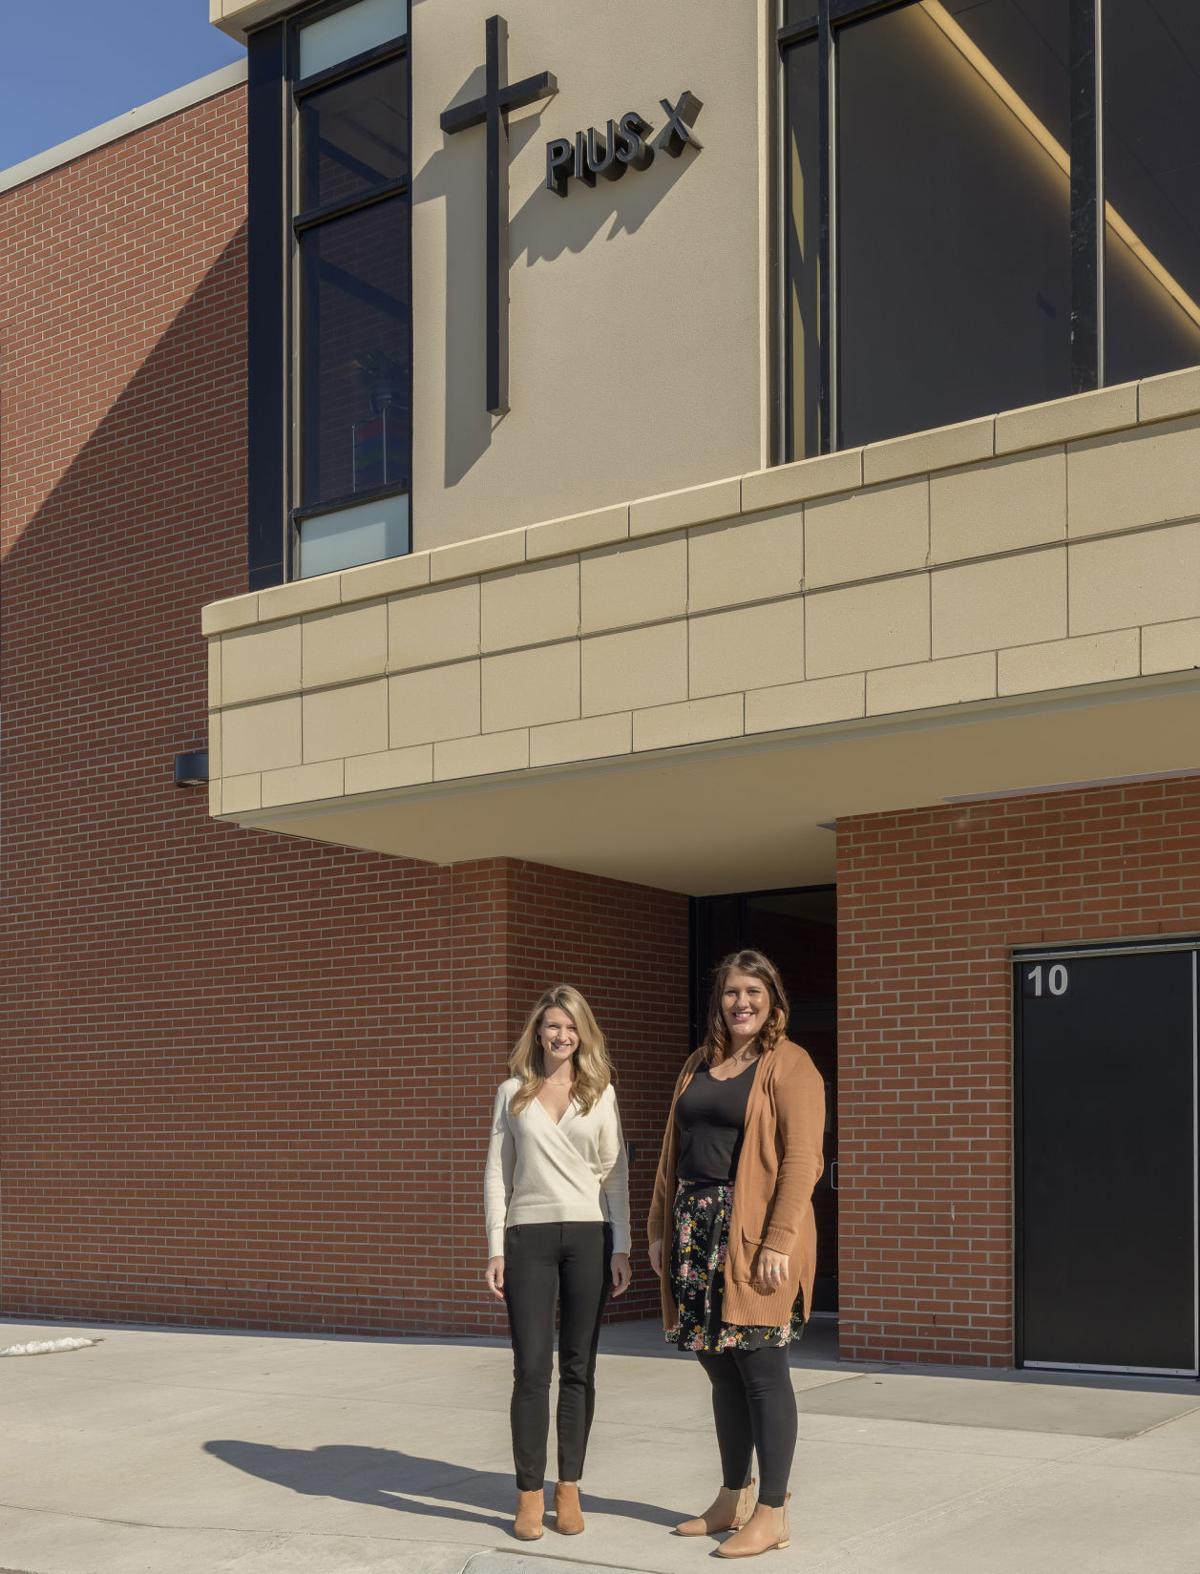 Kathryn Bergen, Courtney Johnson outside new addition